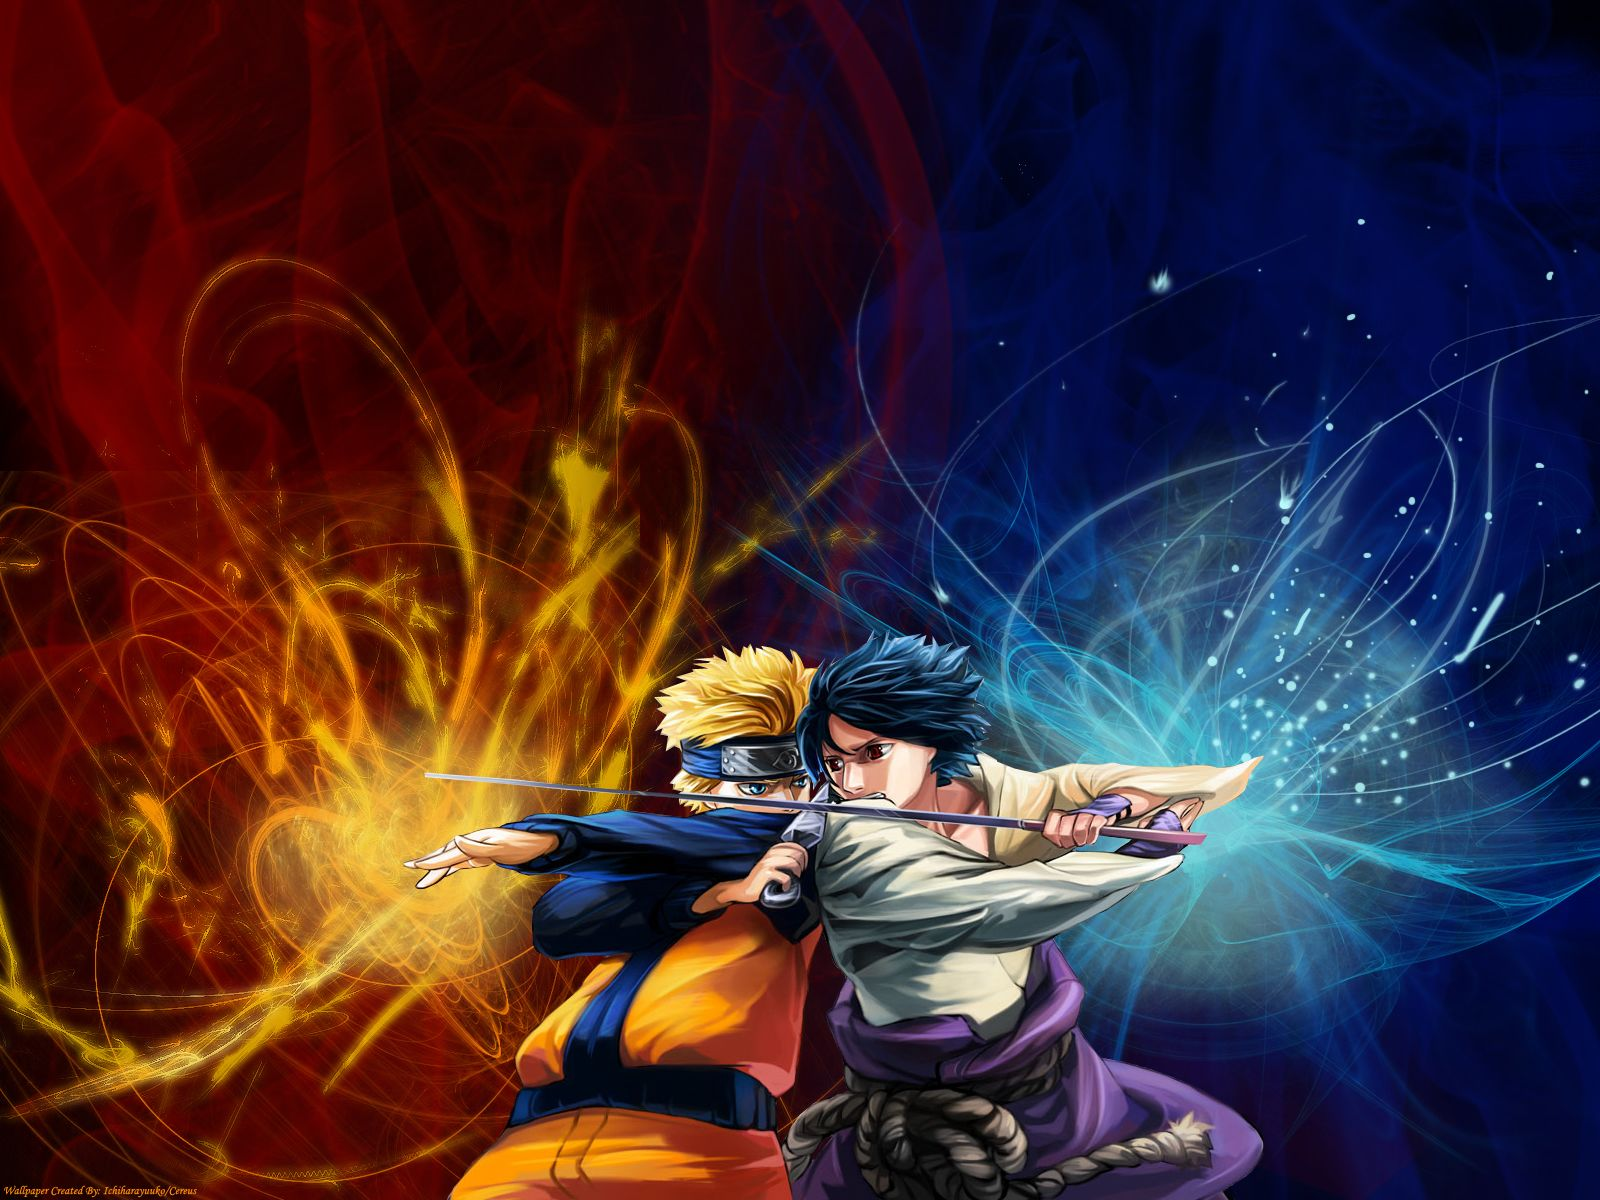 Naruto vs Sasuke Wallpapers Desktop